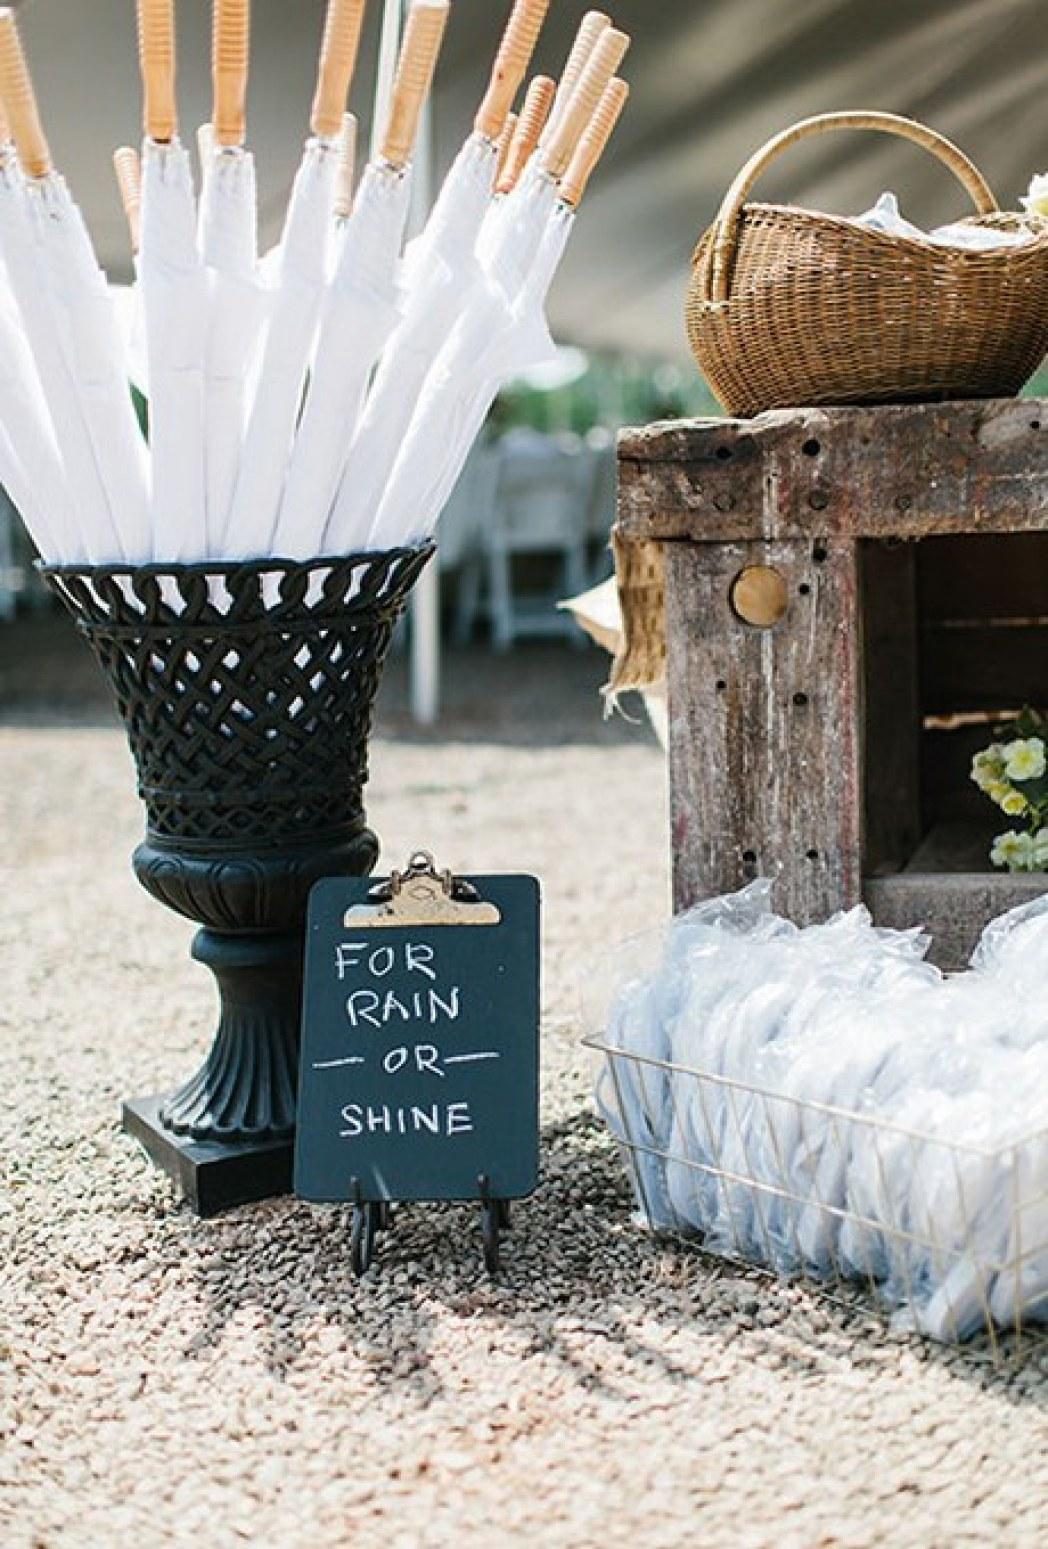 2015_bridescom-Editorial_Images-06-backyard-wedding-ideas-Large-backyard-wedding-ideas-colette-kulig